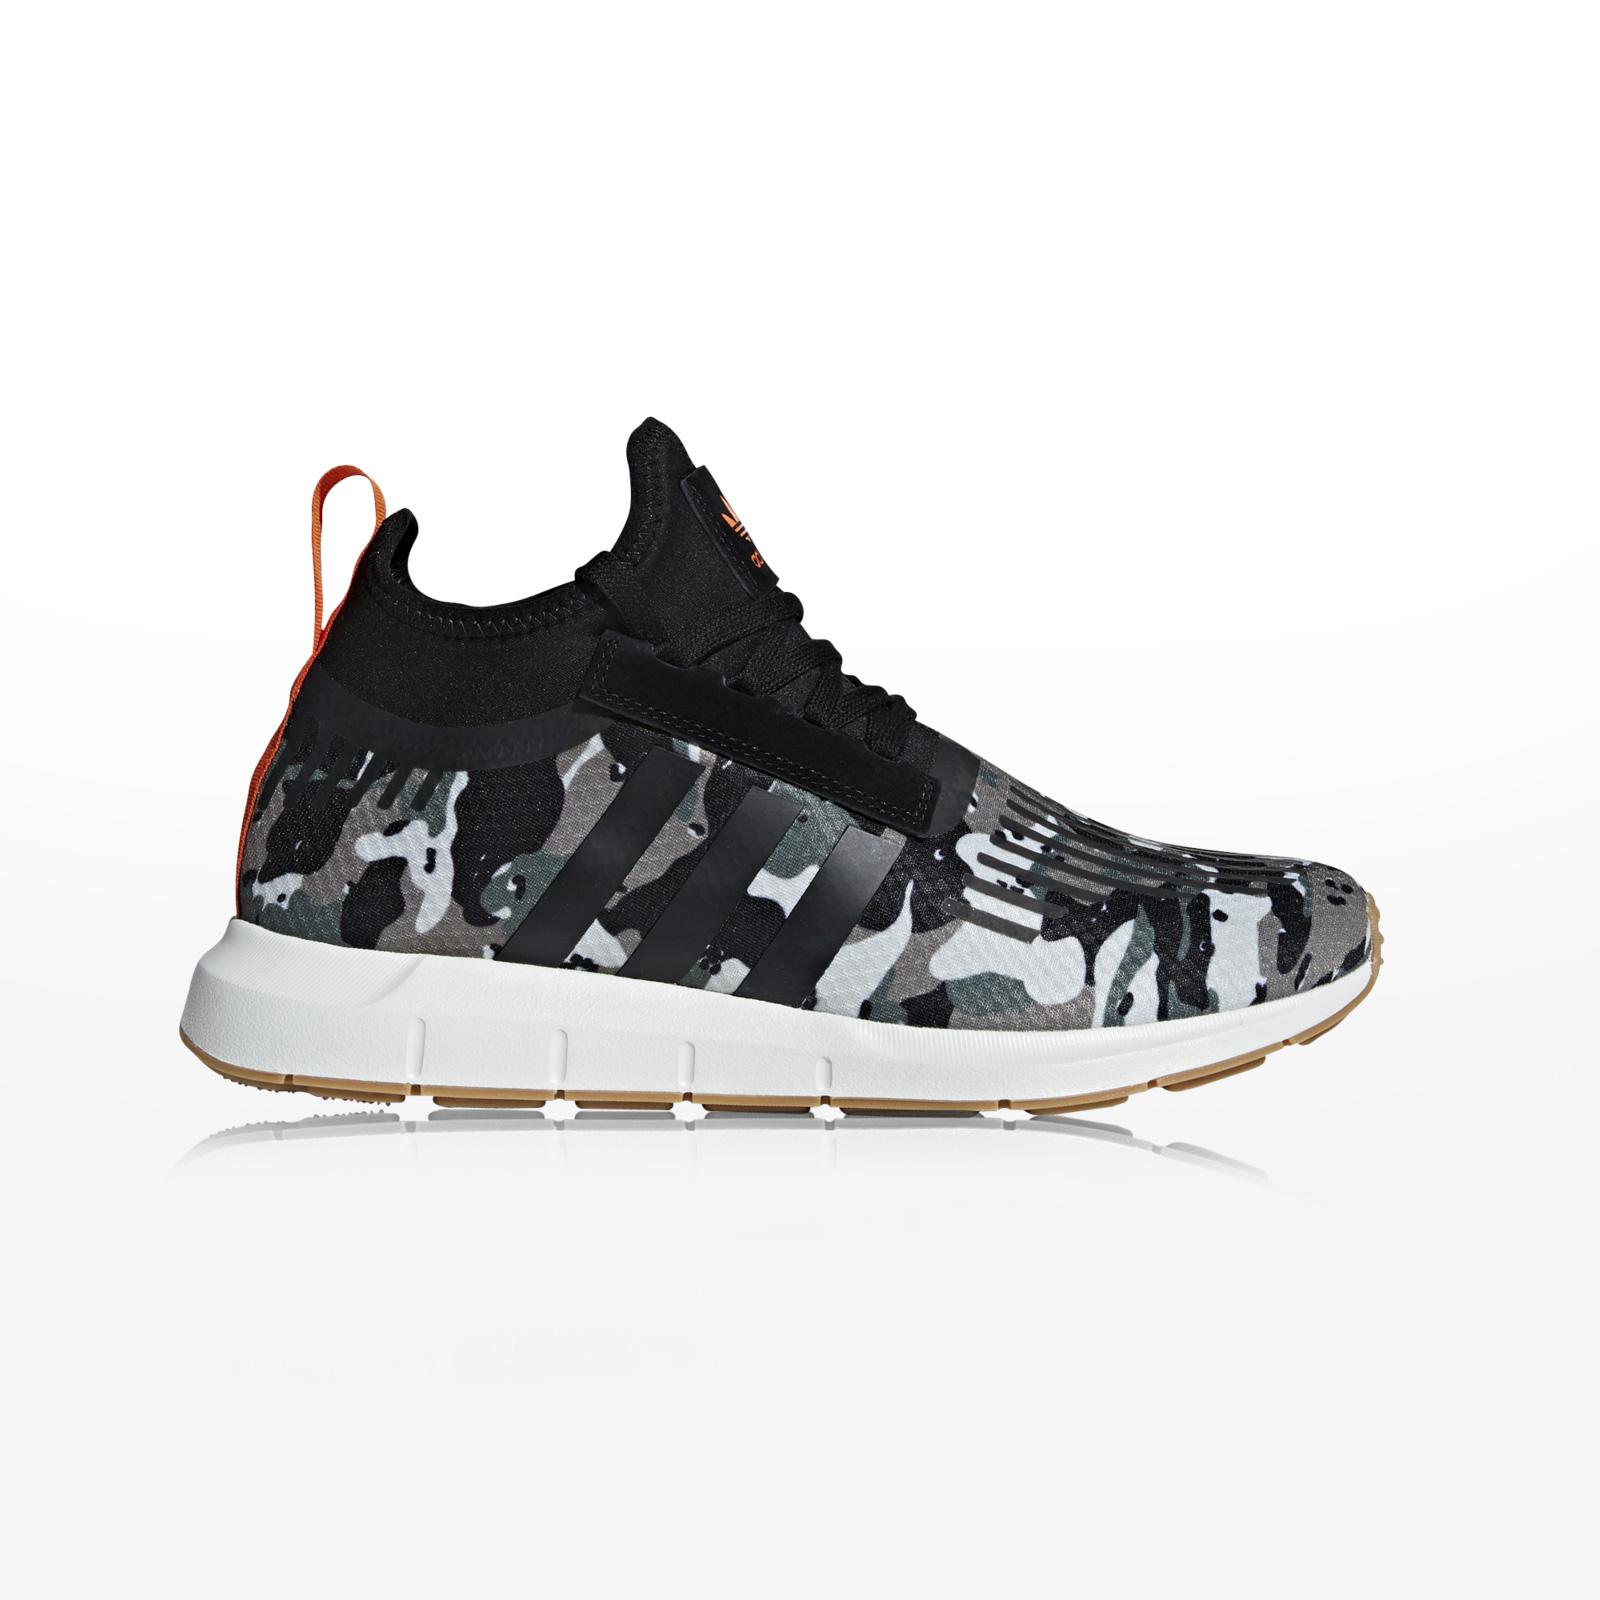 -50% Sportcafe adidas Originals – SWIFT RUN BARRIER – TRACAR CBLACK ORANGE 475a45b5137